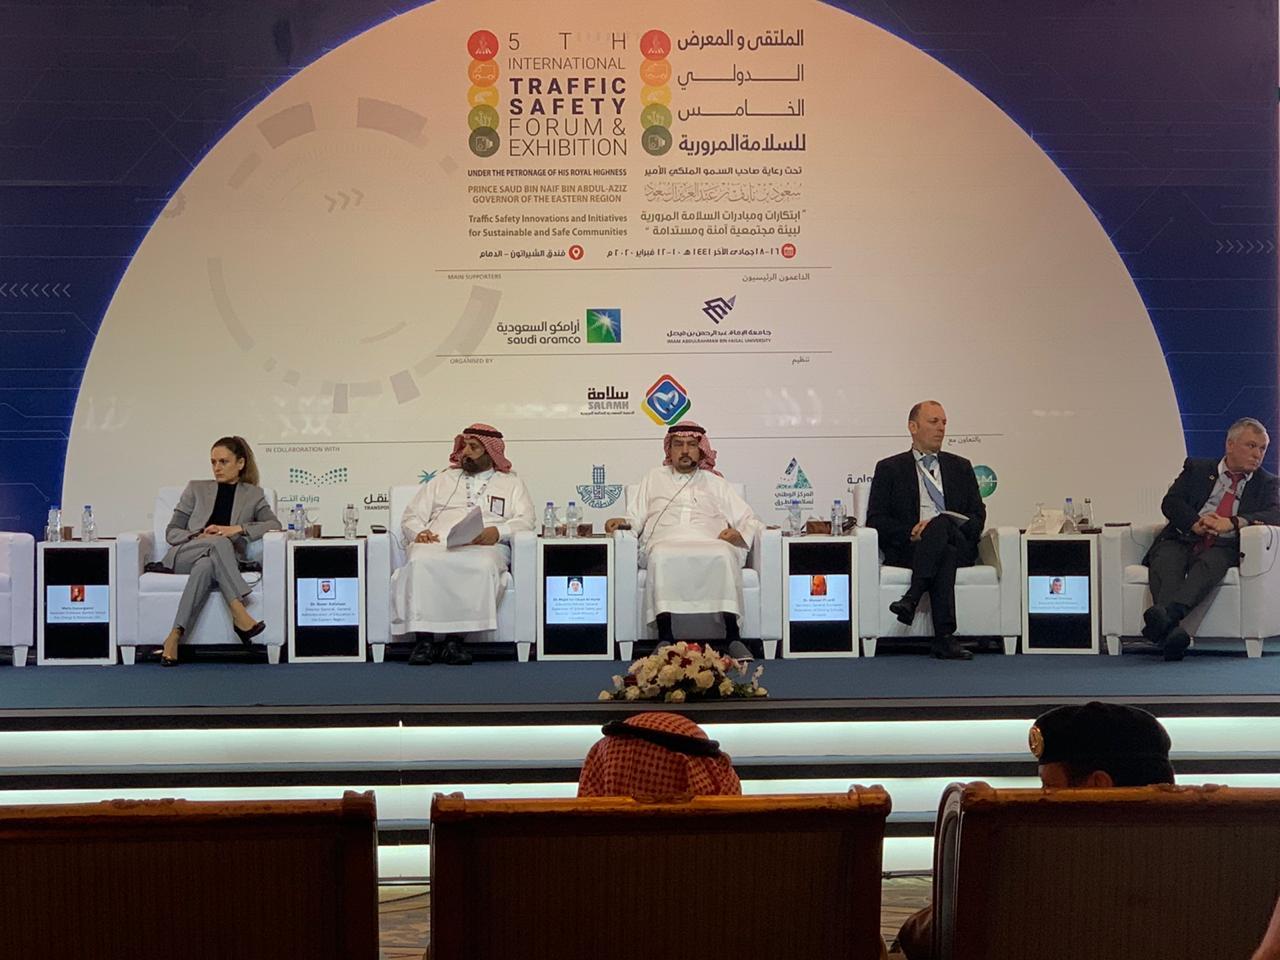 20200210 International Traffic Safety Forum (7)